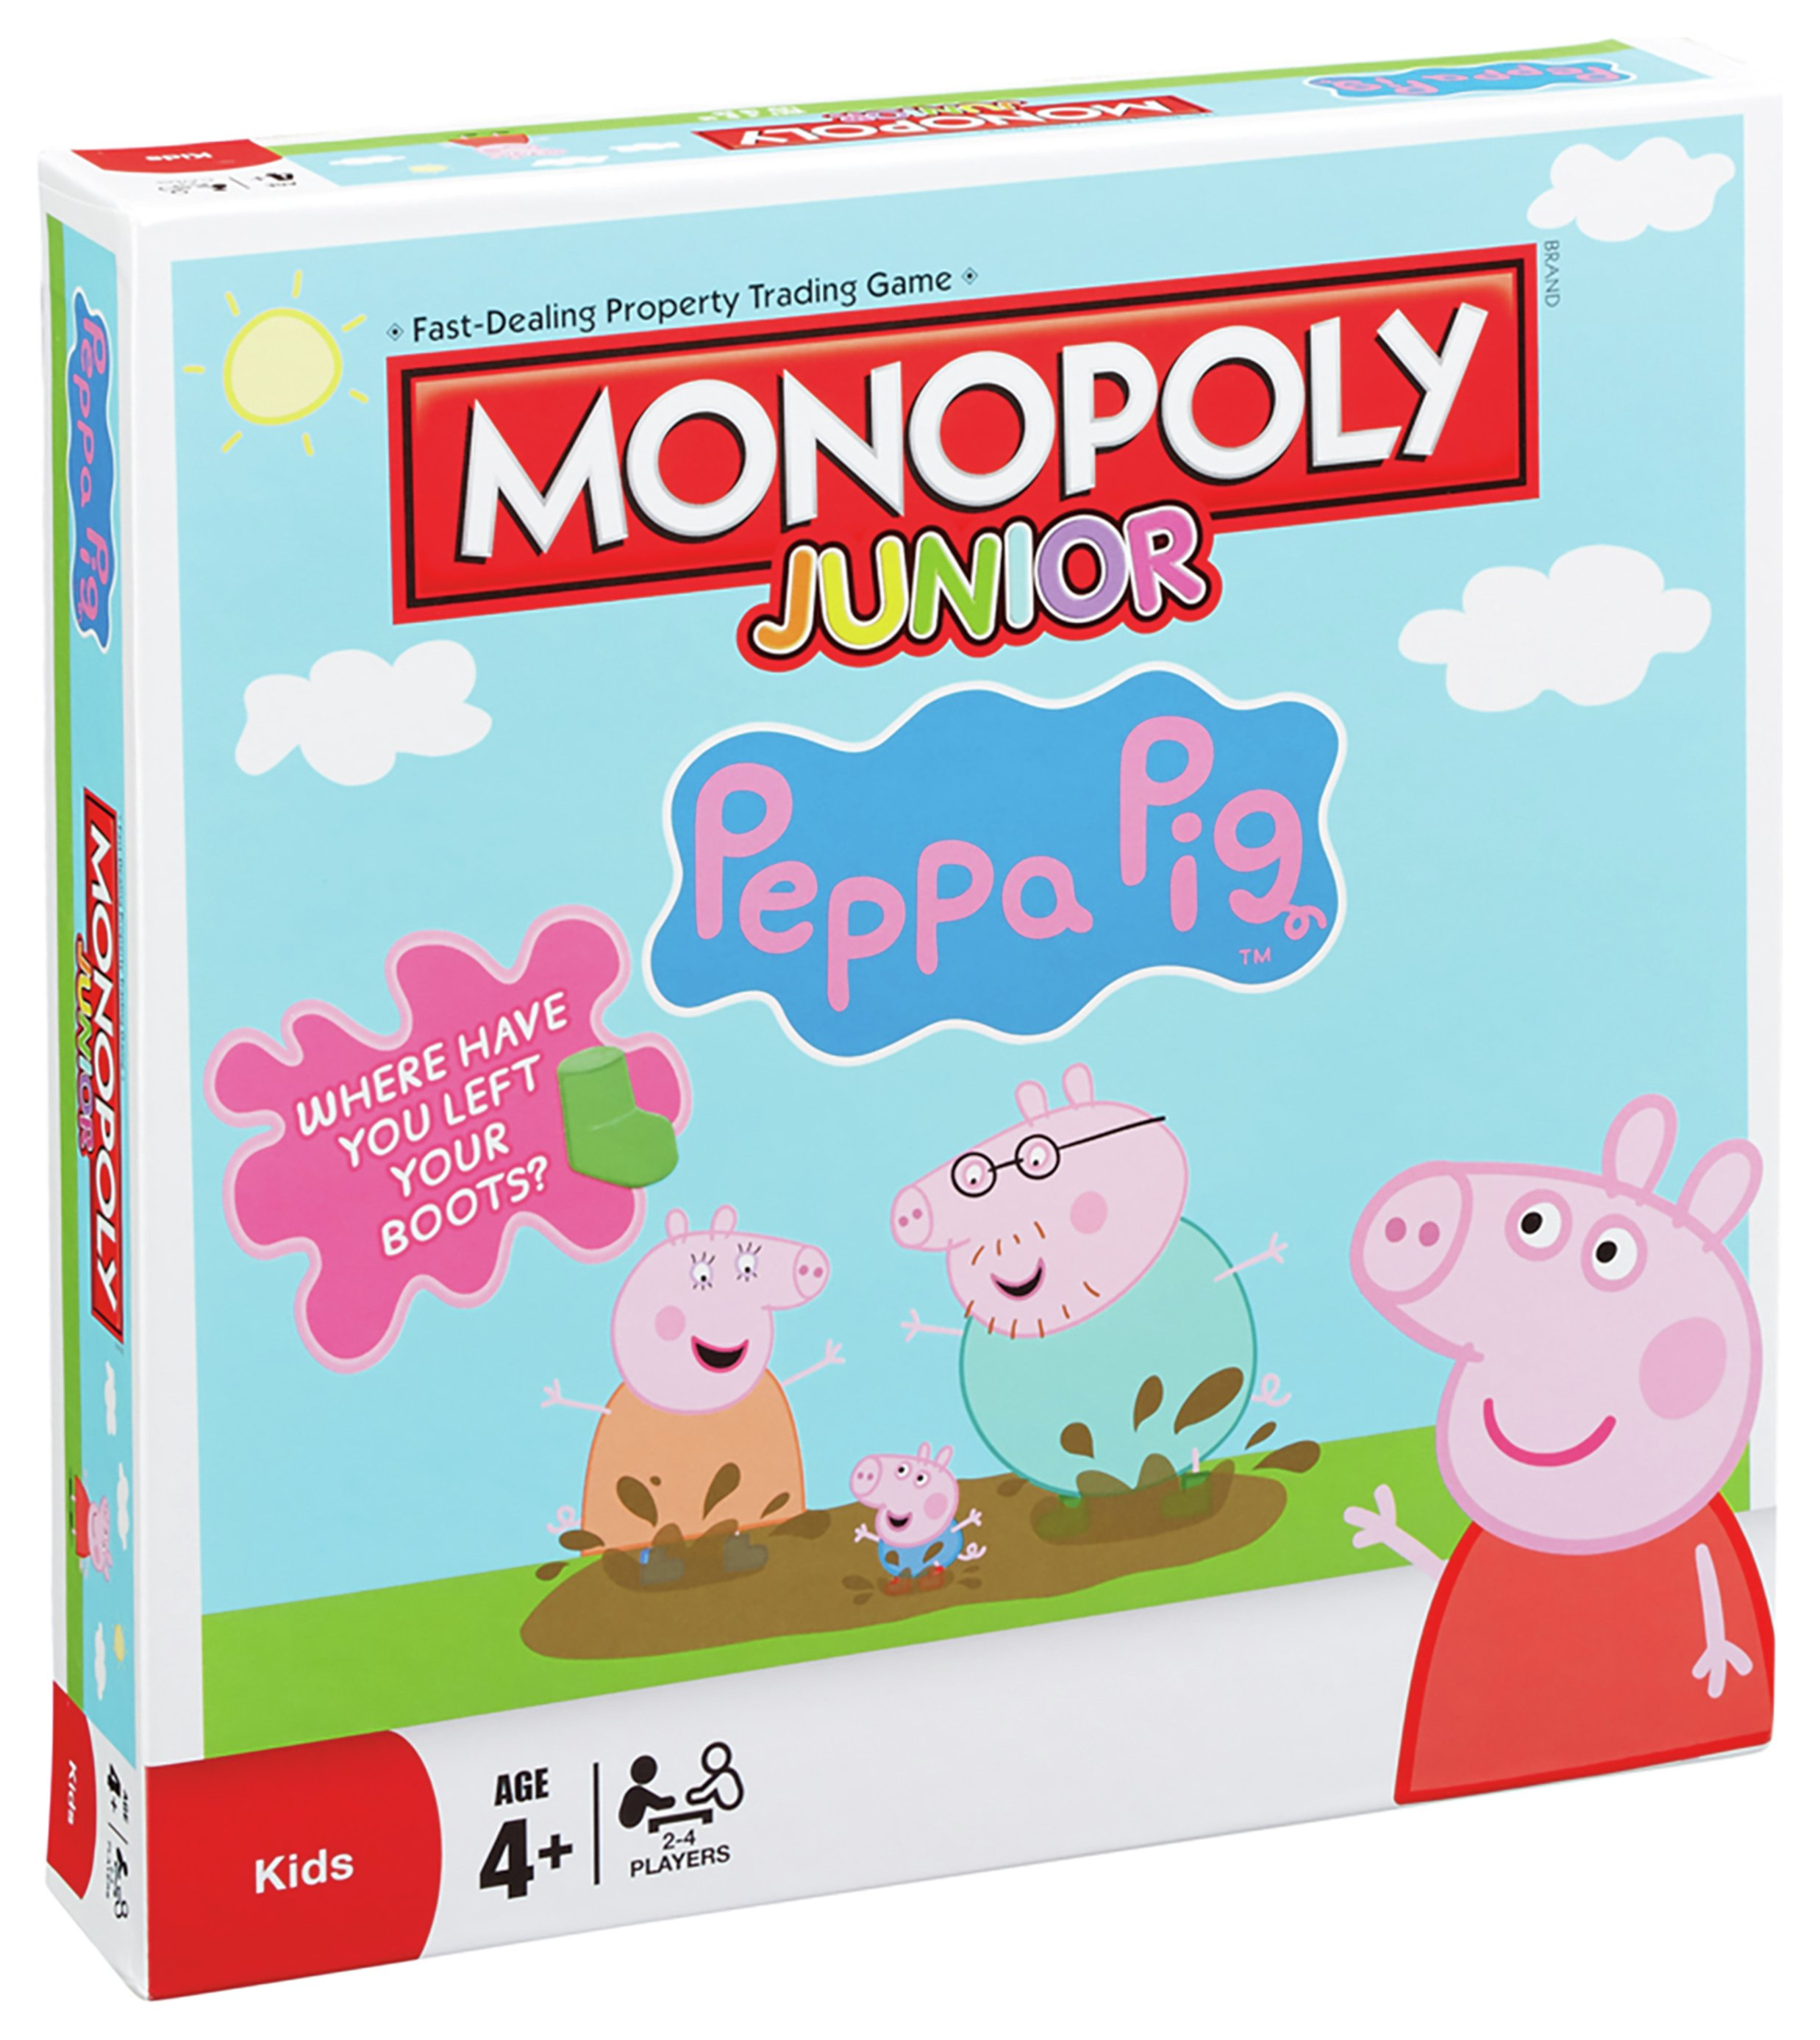 Peppa Pig - Junior Monopoly -  Game.